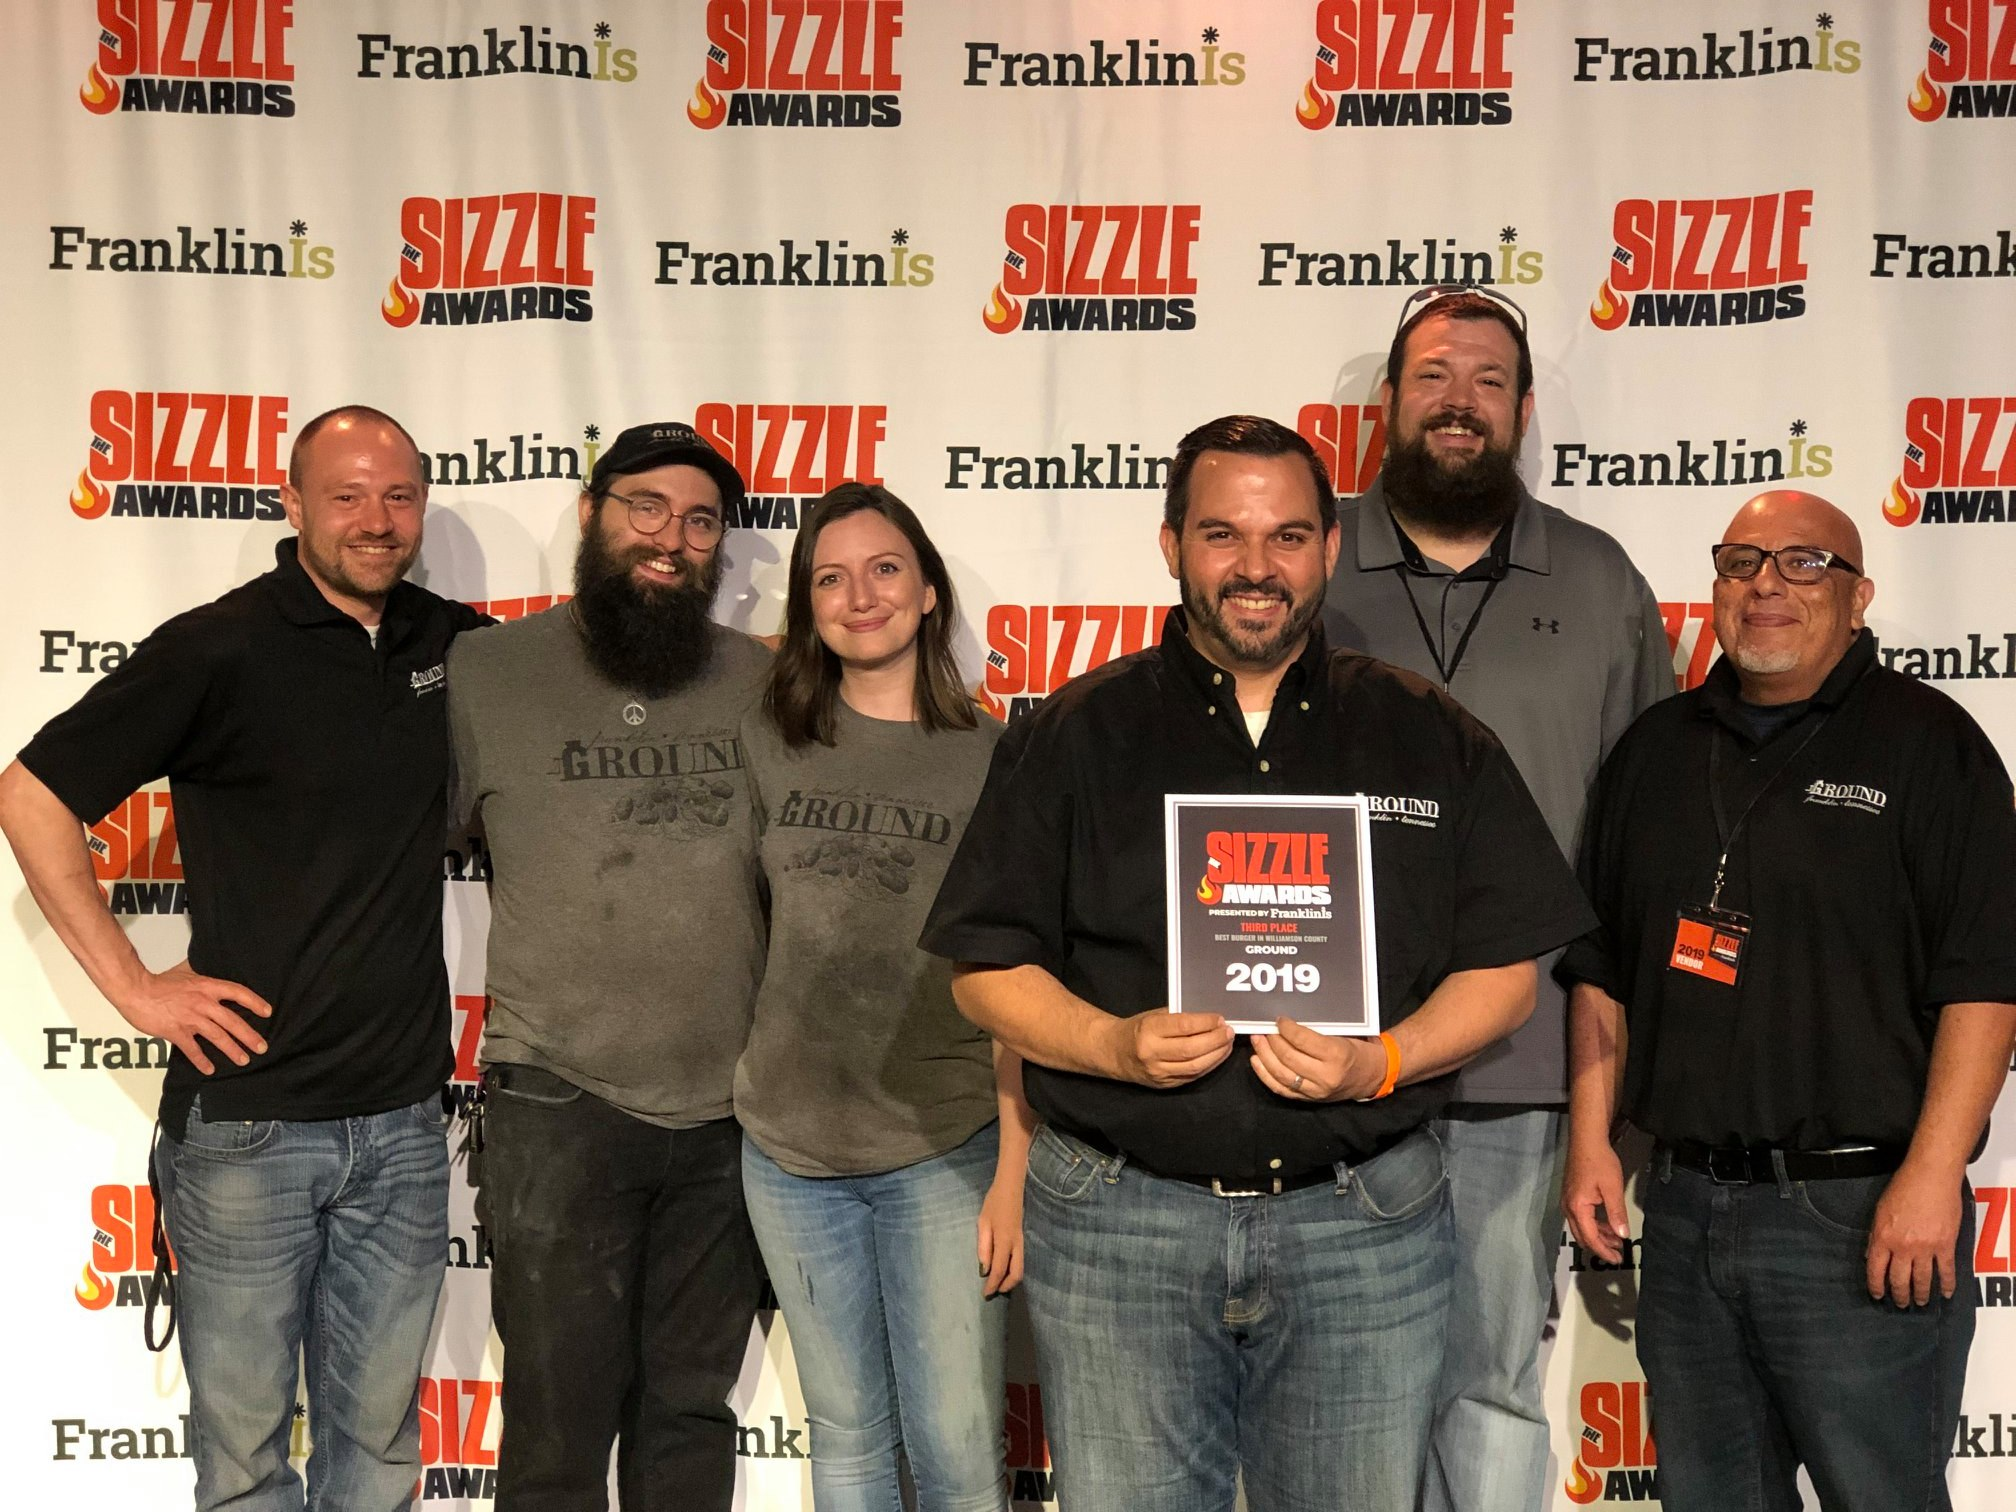 Sizzle Awards 2019Best Burger 3rd Place - FranklinIs.com